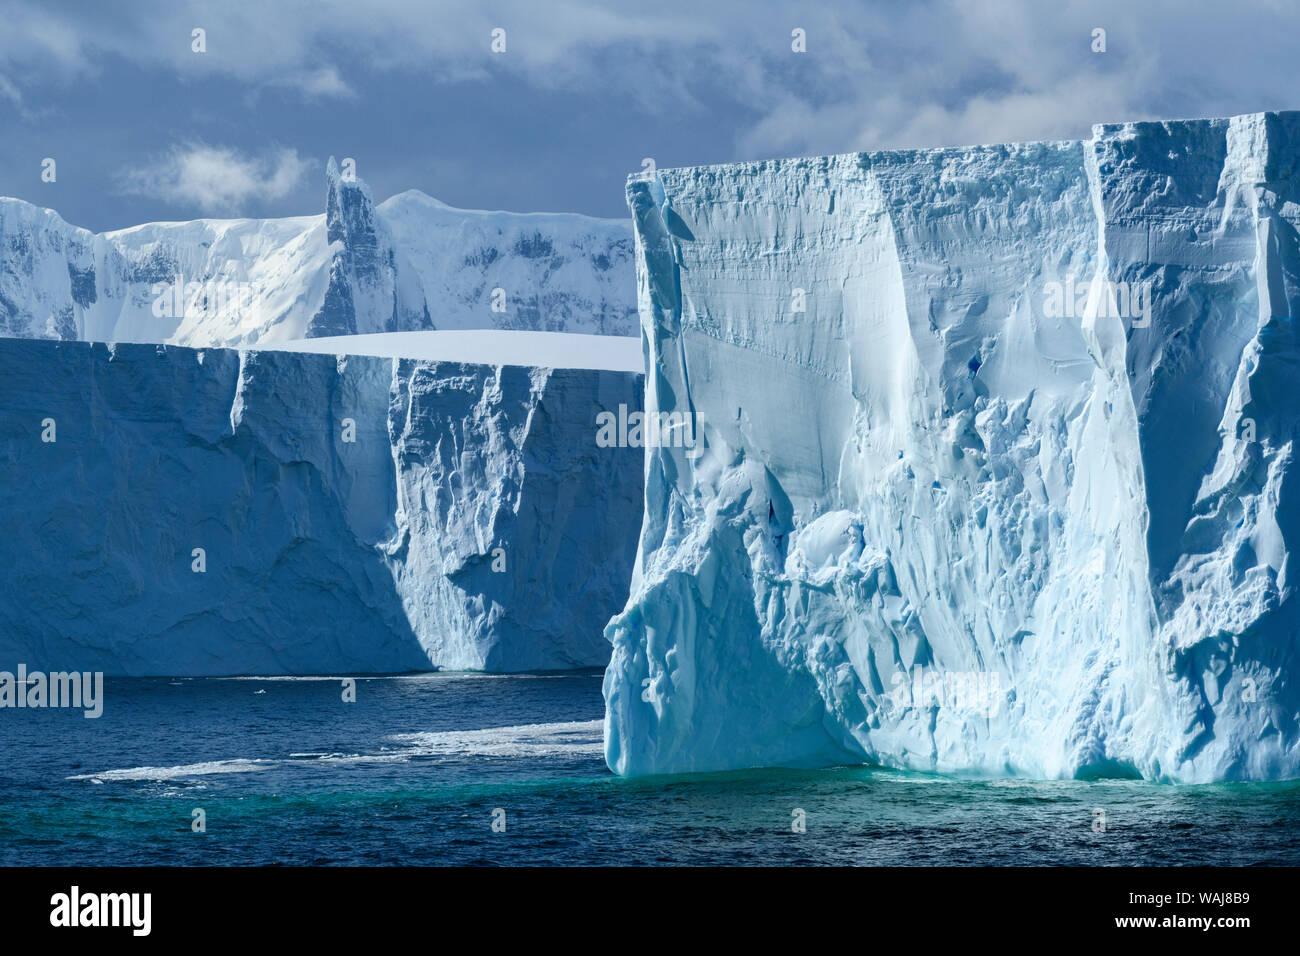 Antarctica, Antarctic Peninsula. Tabular iceberg. Stock Photo